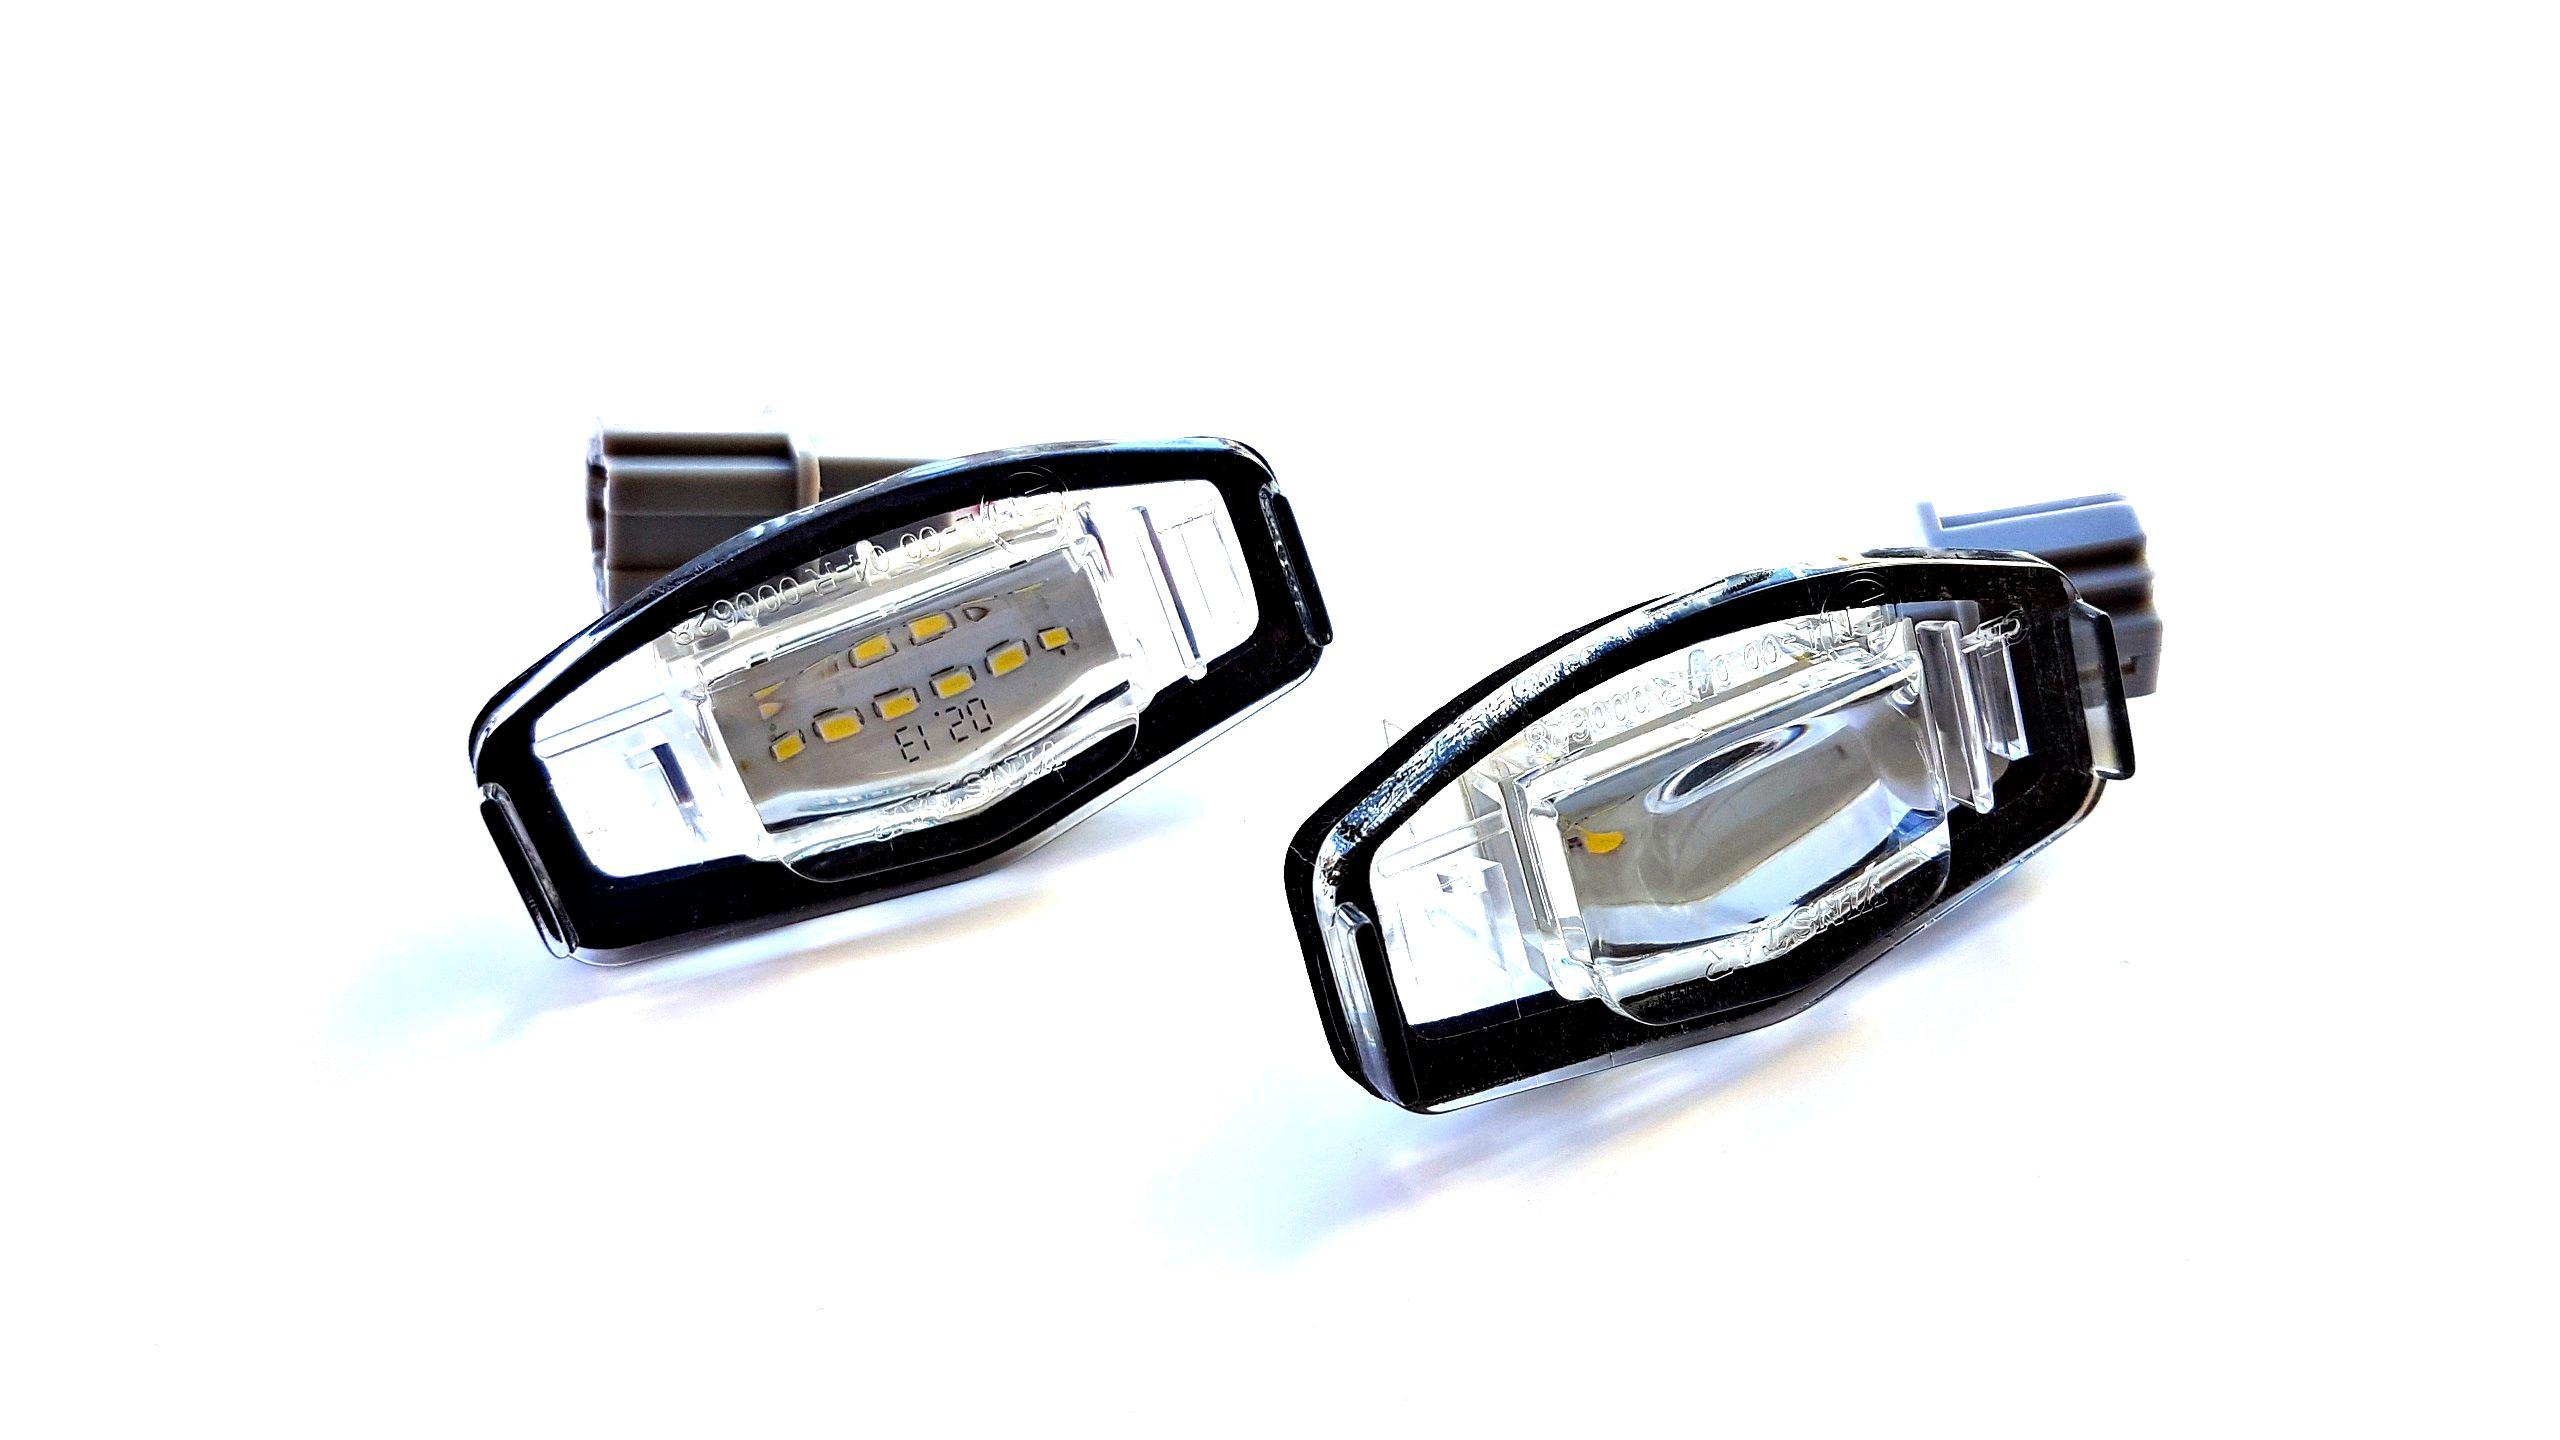 PLAFONES MATRICULA LED ACURA LMD030202